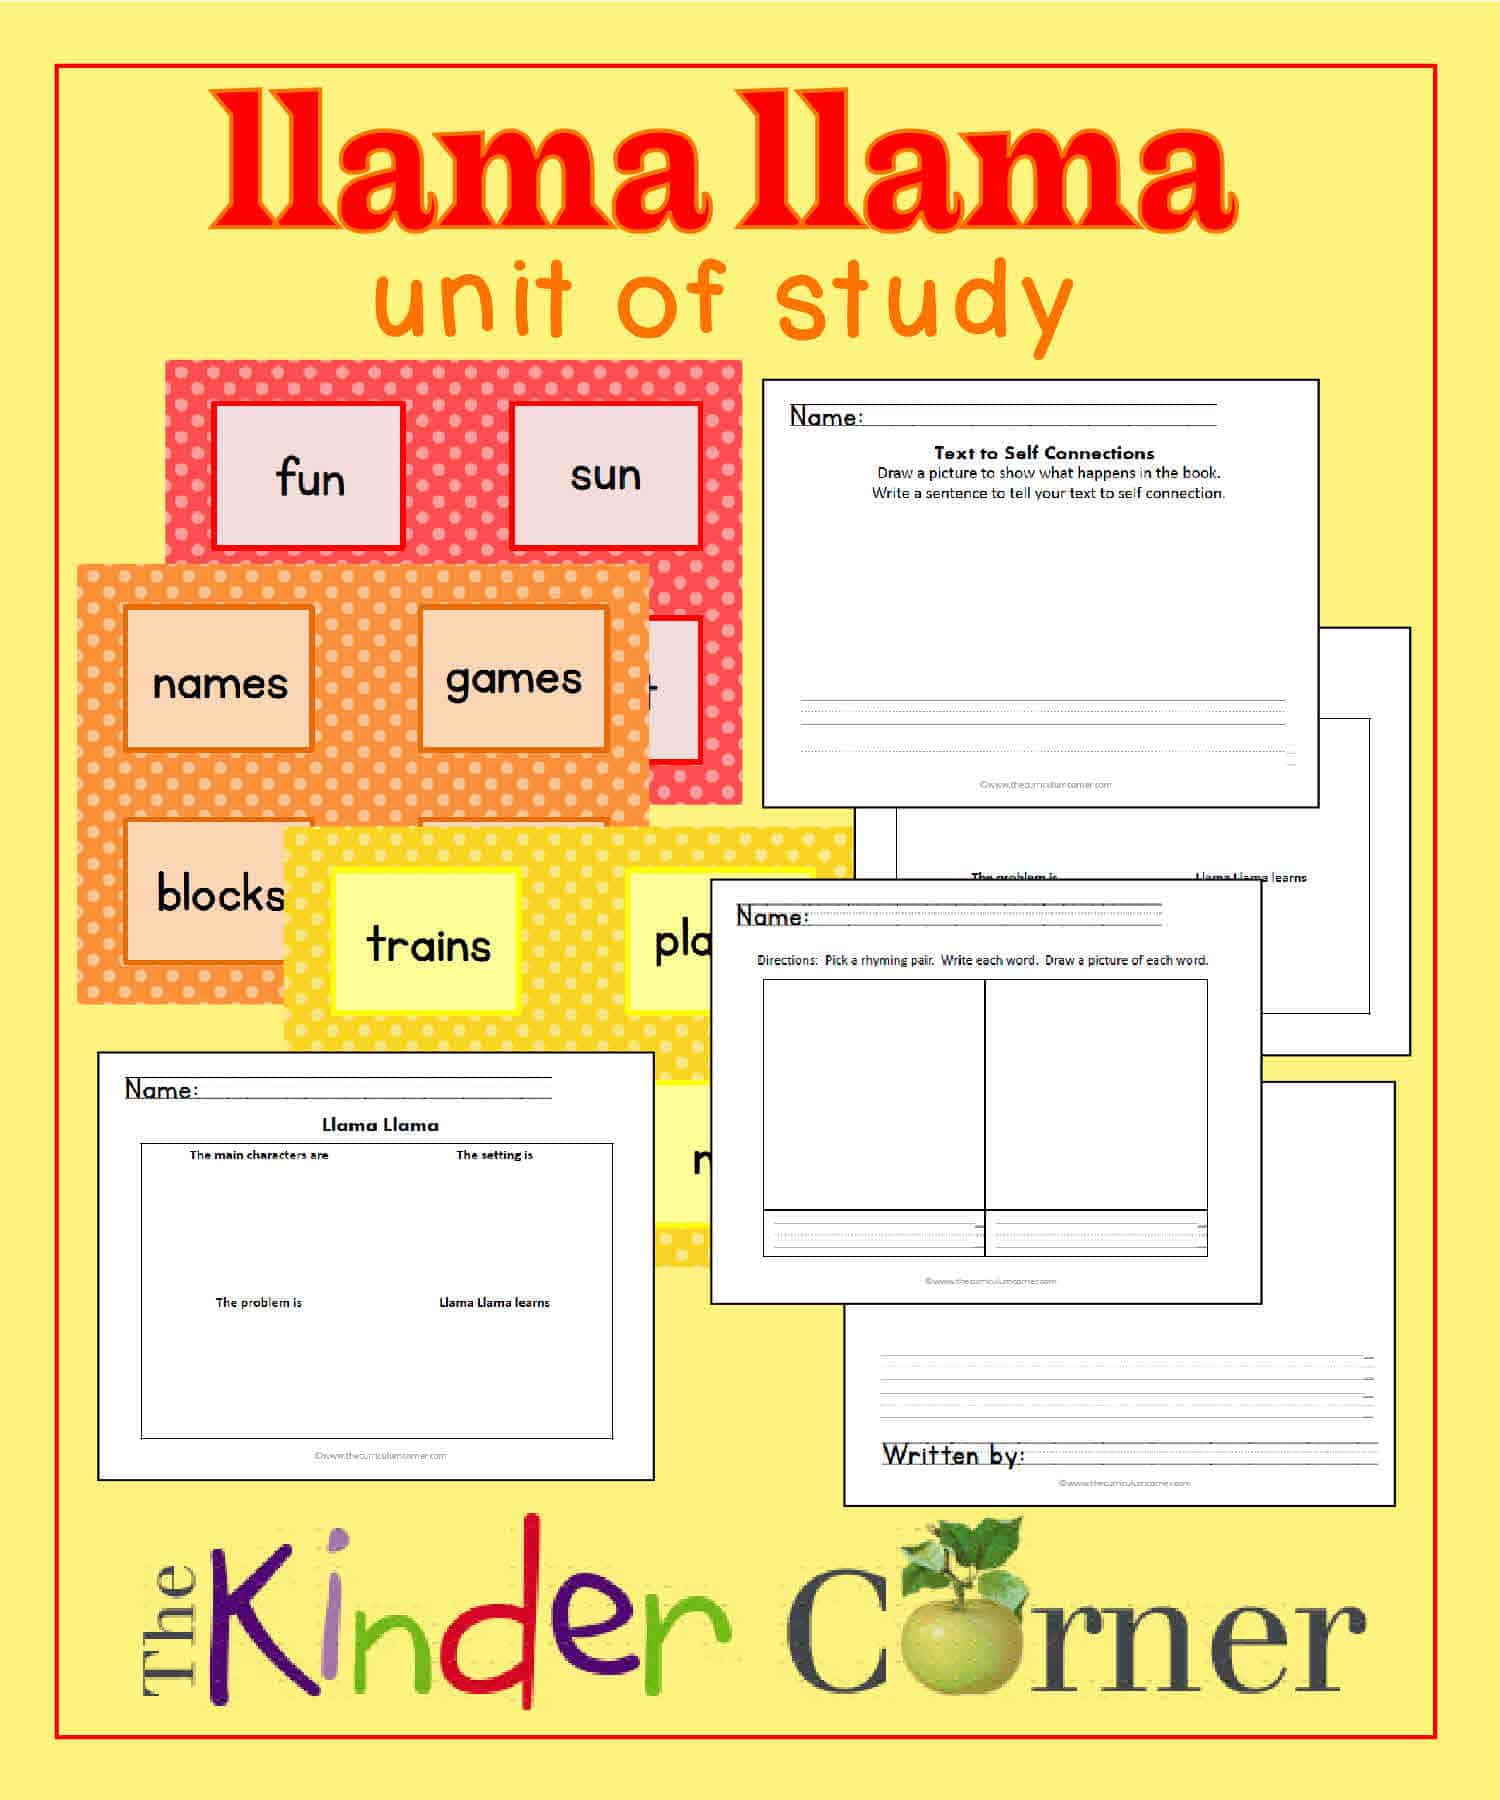 llama llama unit of study the kinder corner